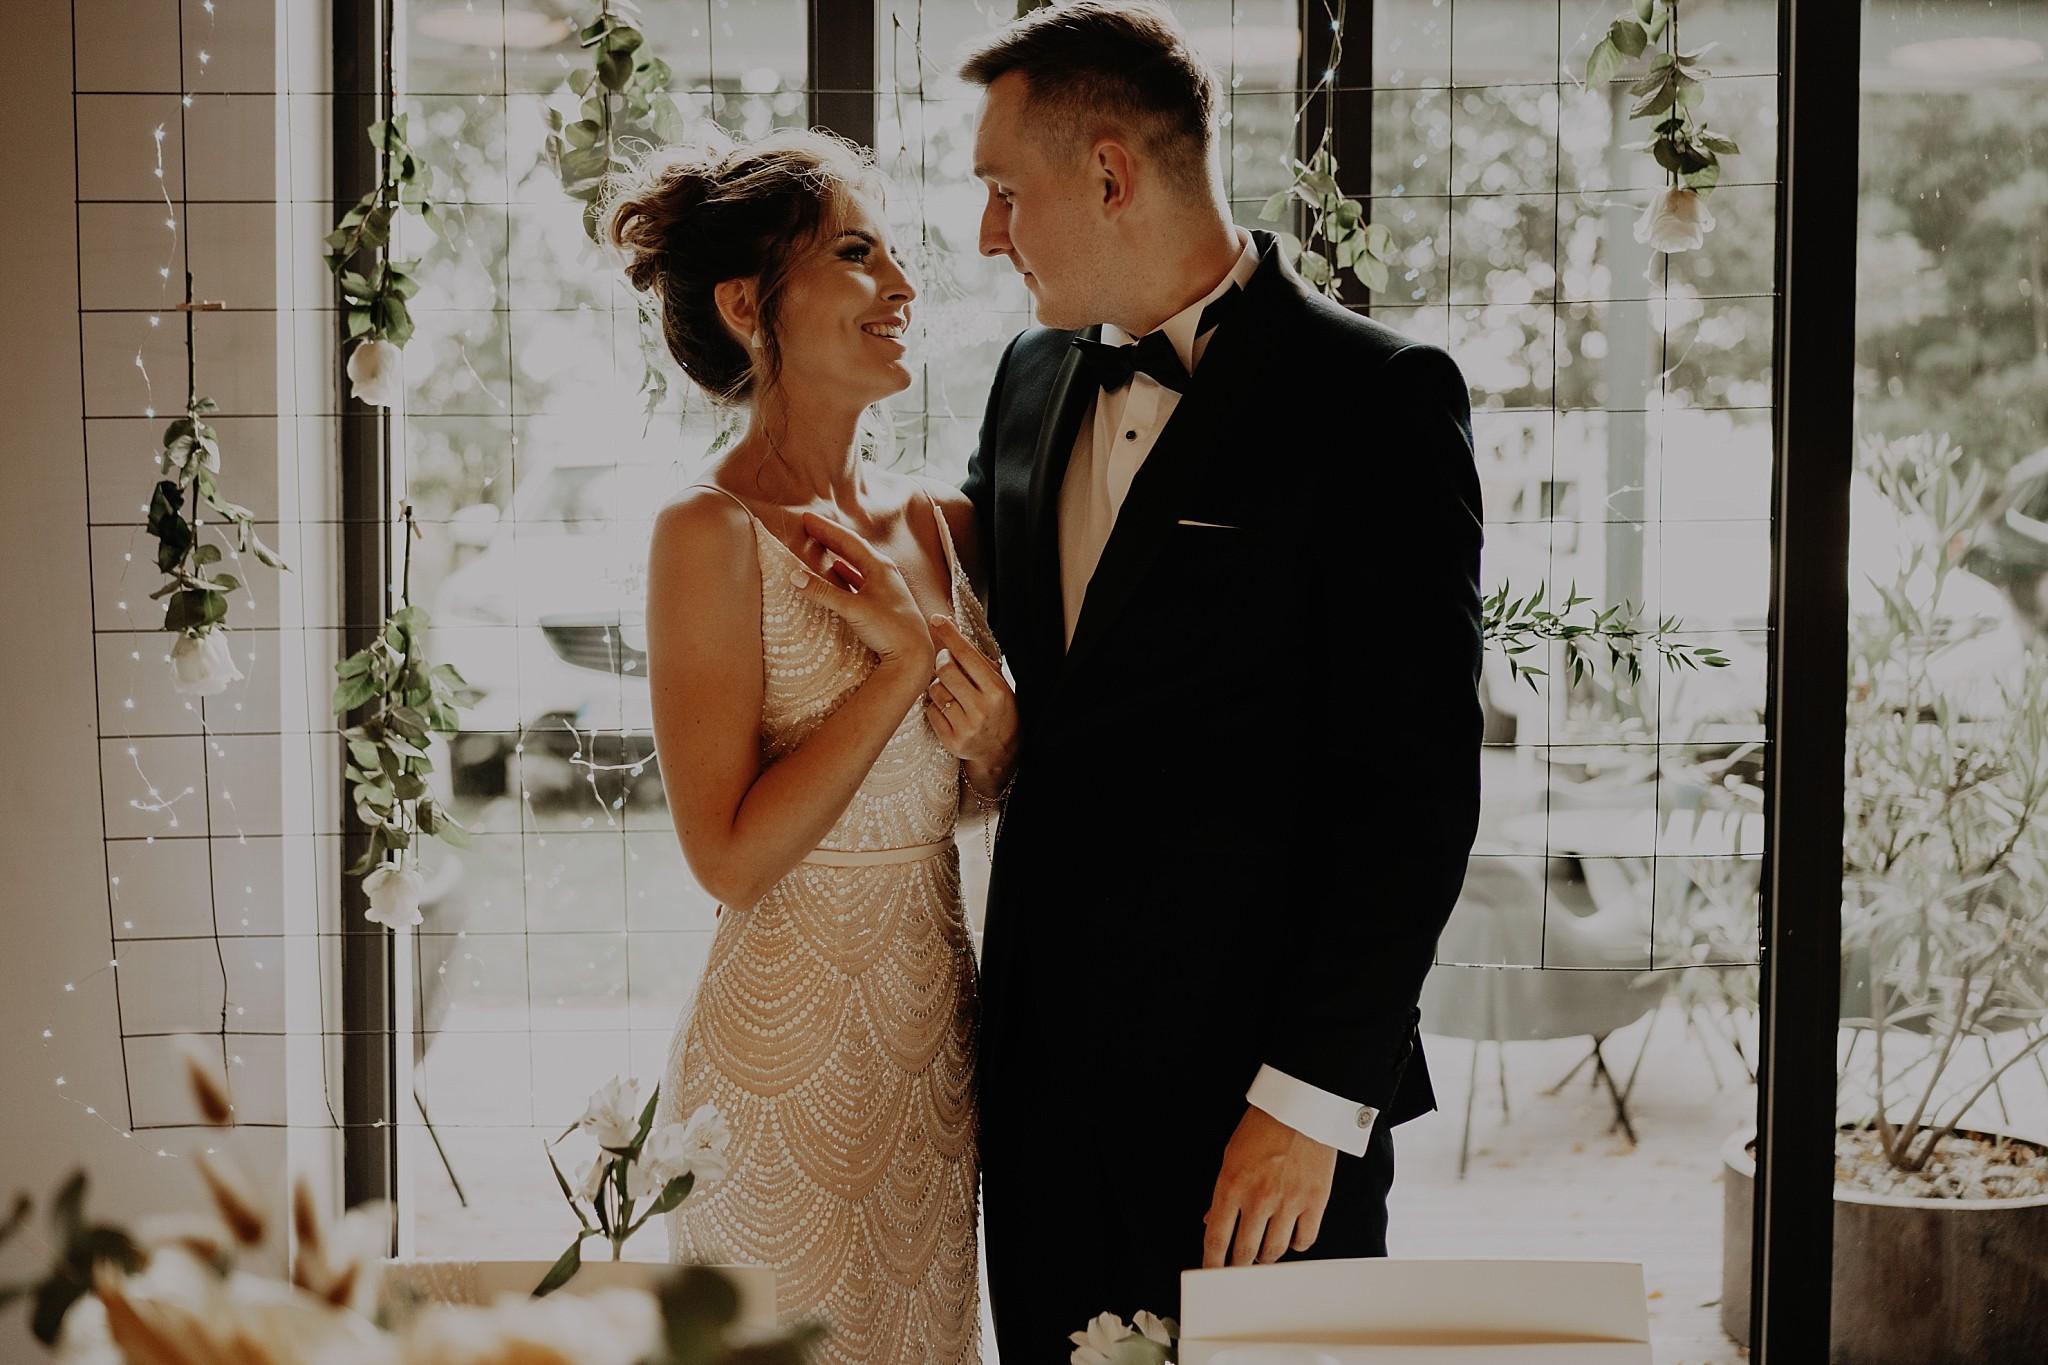 fotograf poznan wesele dobra truskawka piekne wesele pod poznaniem wesele w dobrej truskawce piekna para mloda slub marzen slub koronawirus slub listopad wesele koronawirus 300